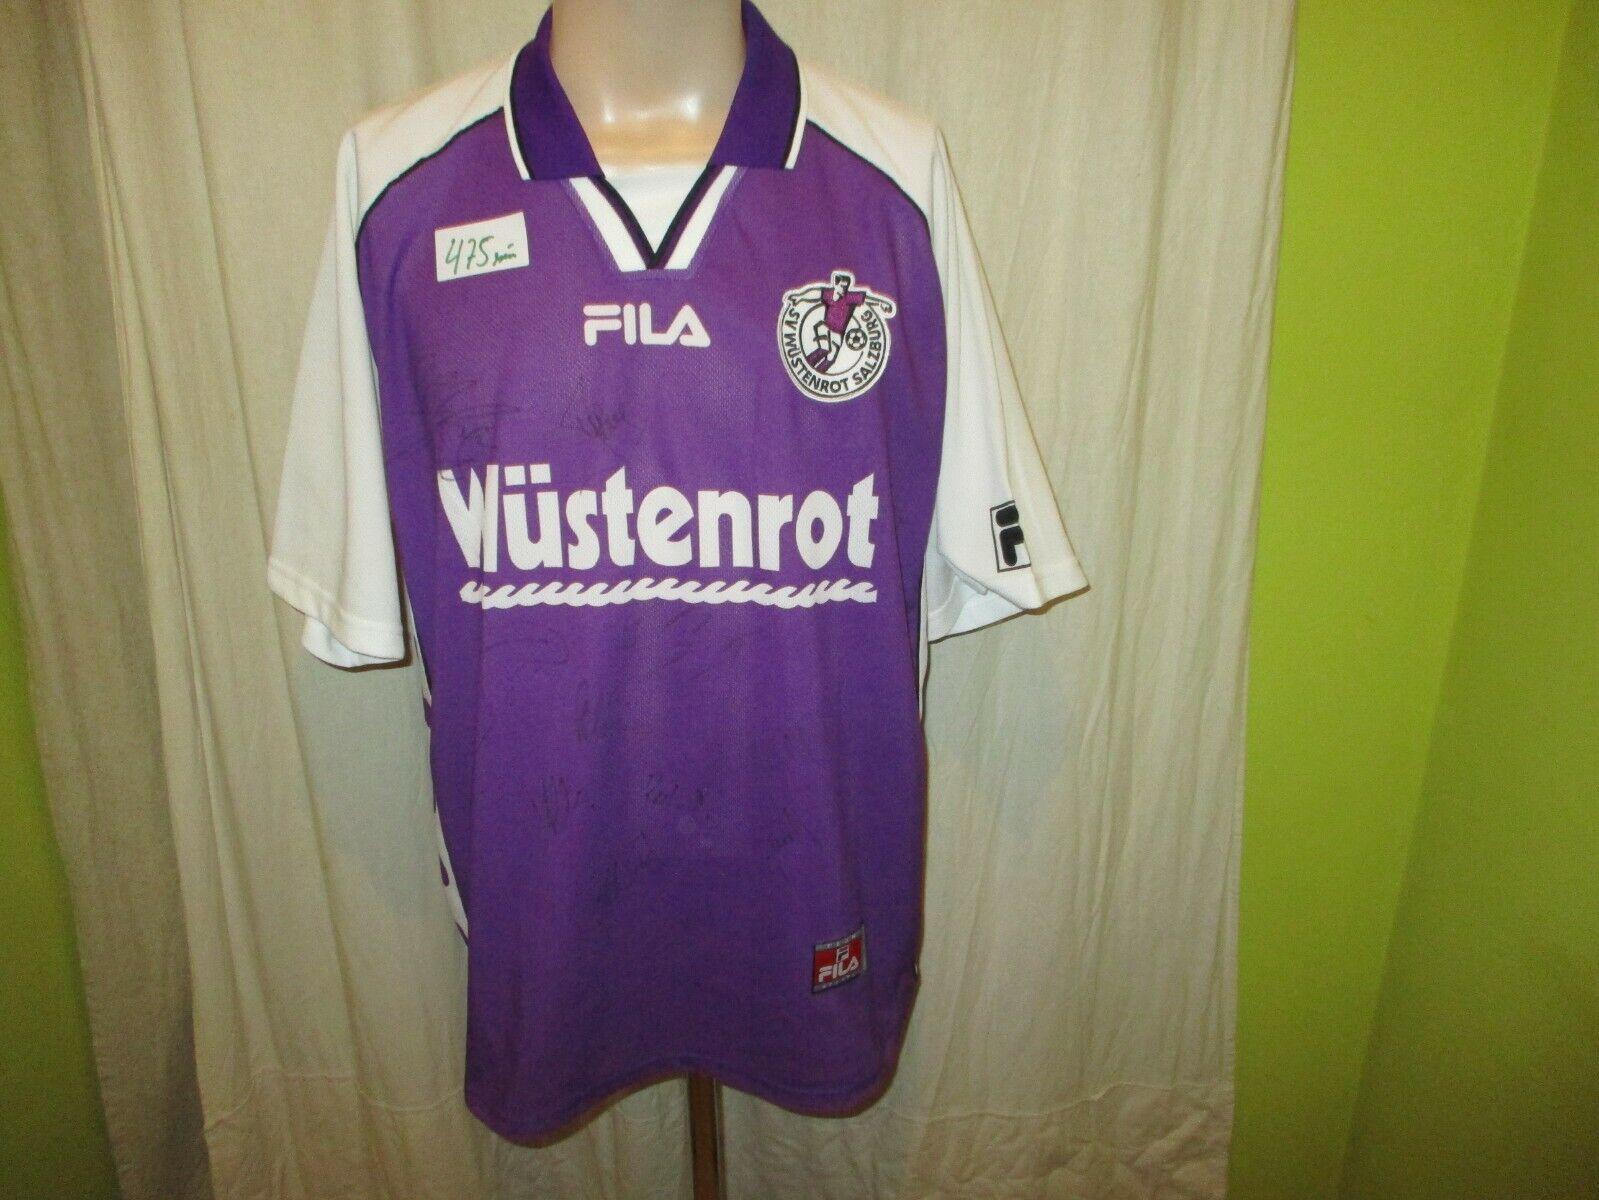 SV Wüstenrot Salzburg Fila Trikot 2000 01  Wüstenrot  + Signiert Gr.L TOP